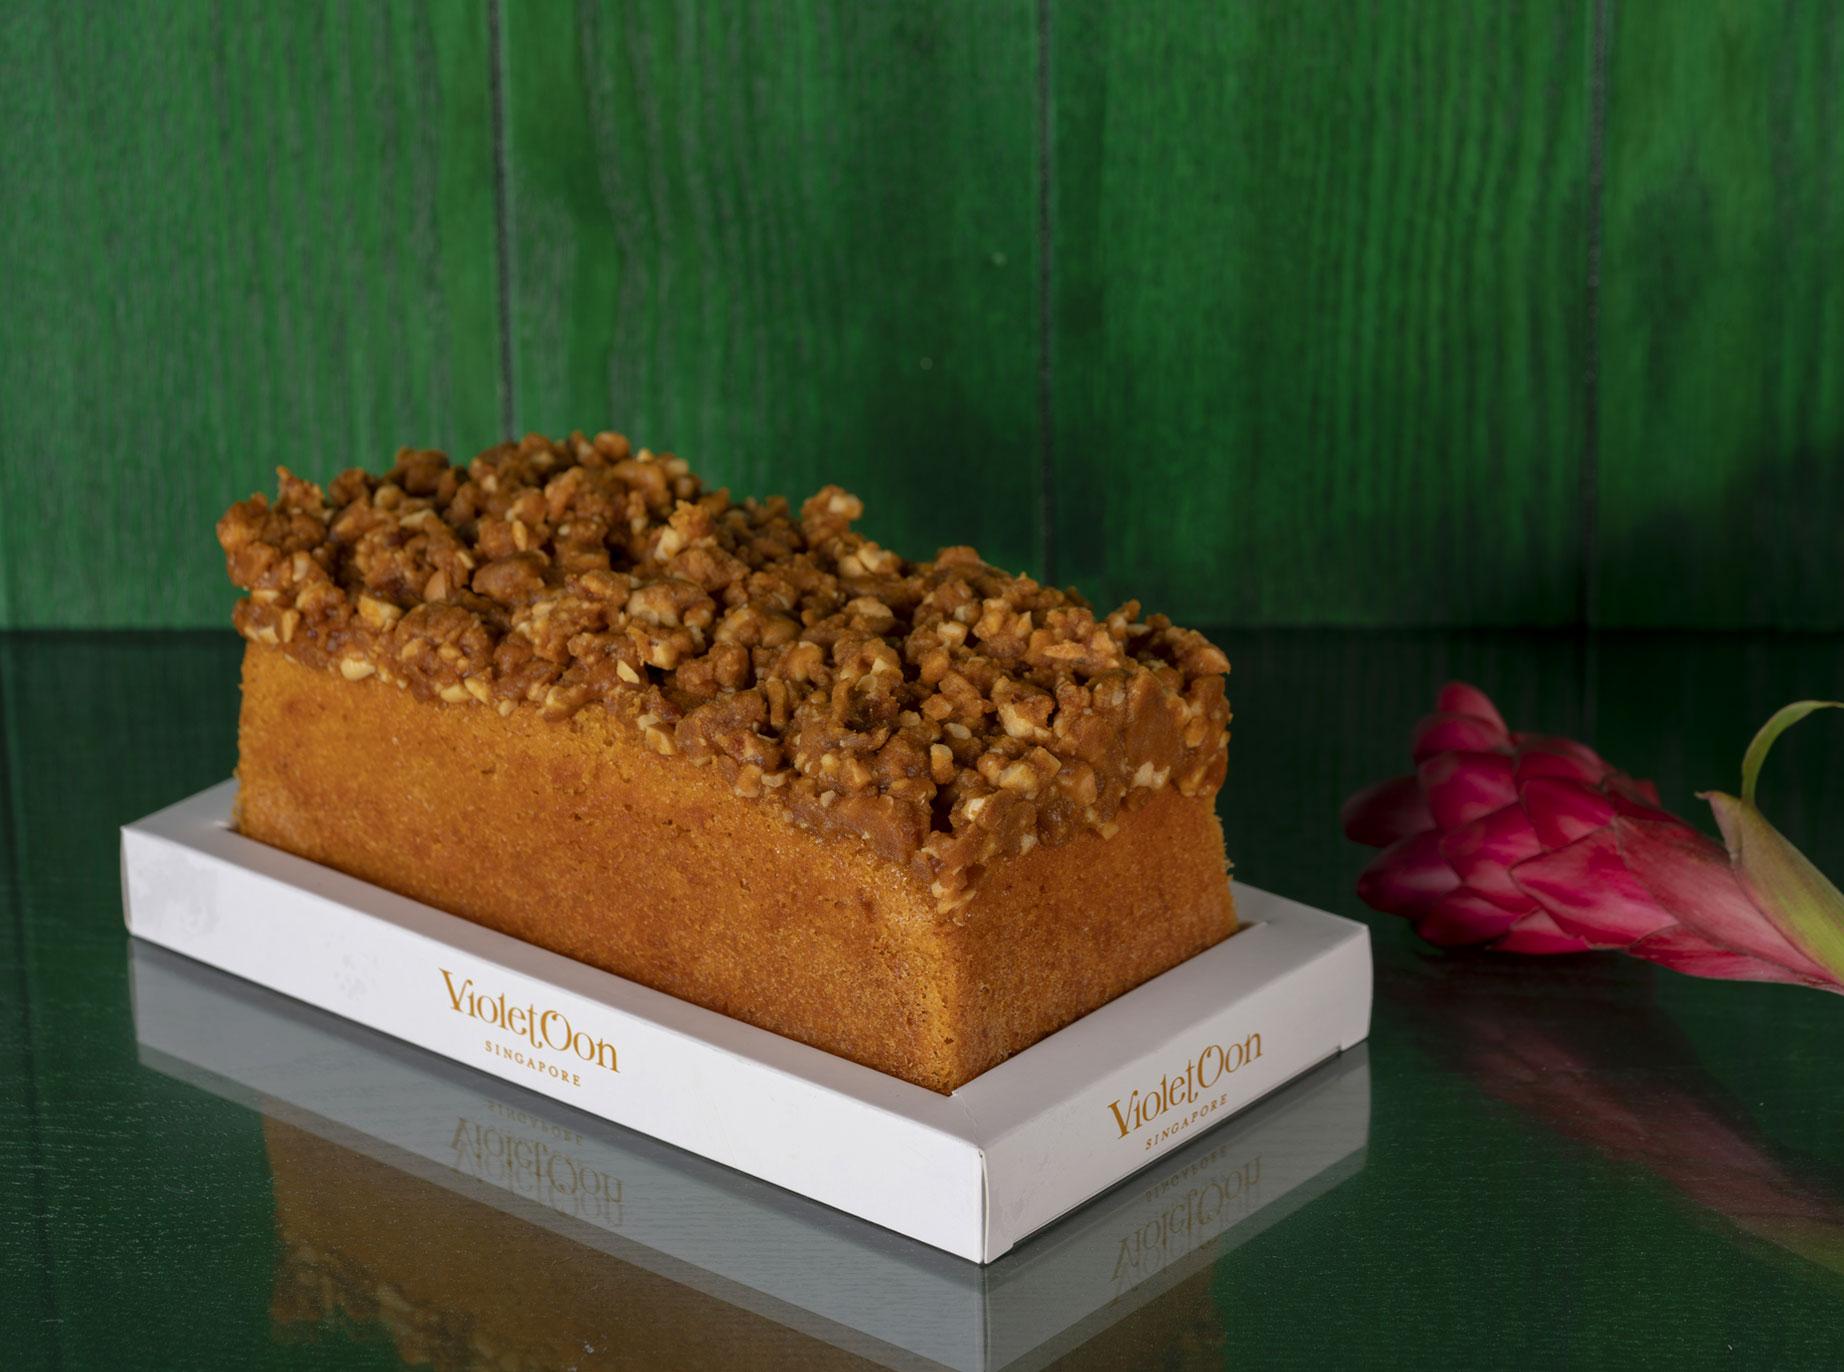 gula-melaka-cake-with-cashew-crumble-tea-cake